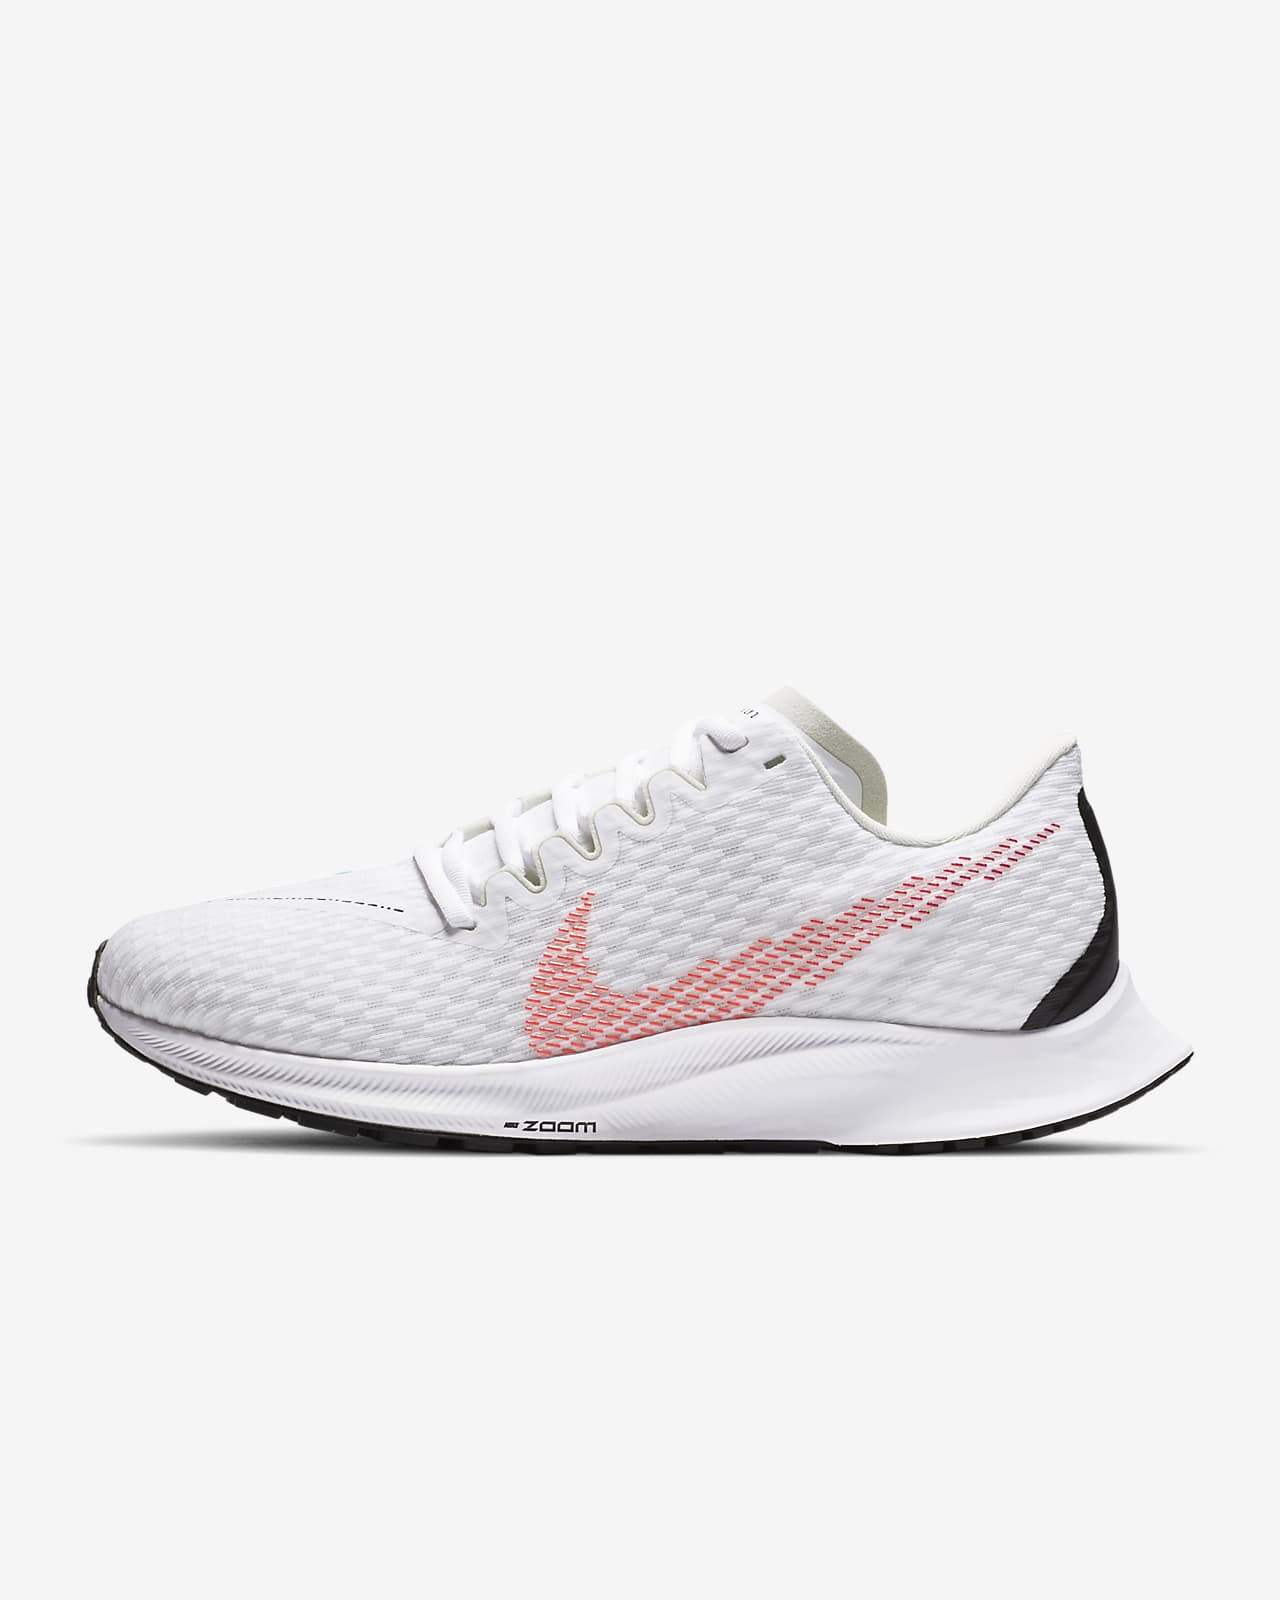 Nike Zoom Rival Fly 2 Damen-Laufschuh